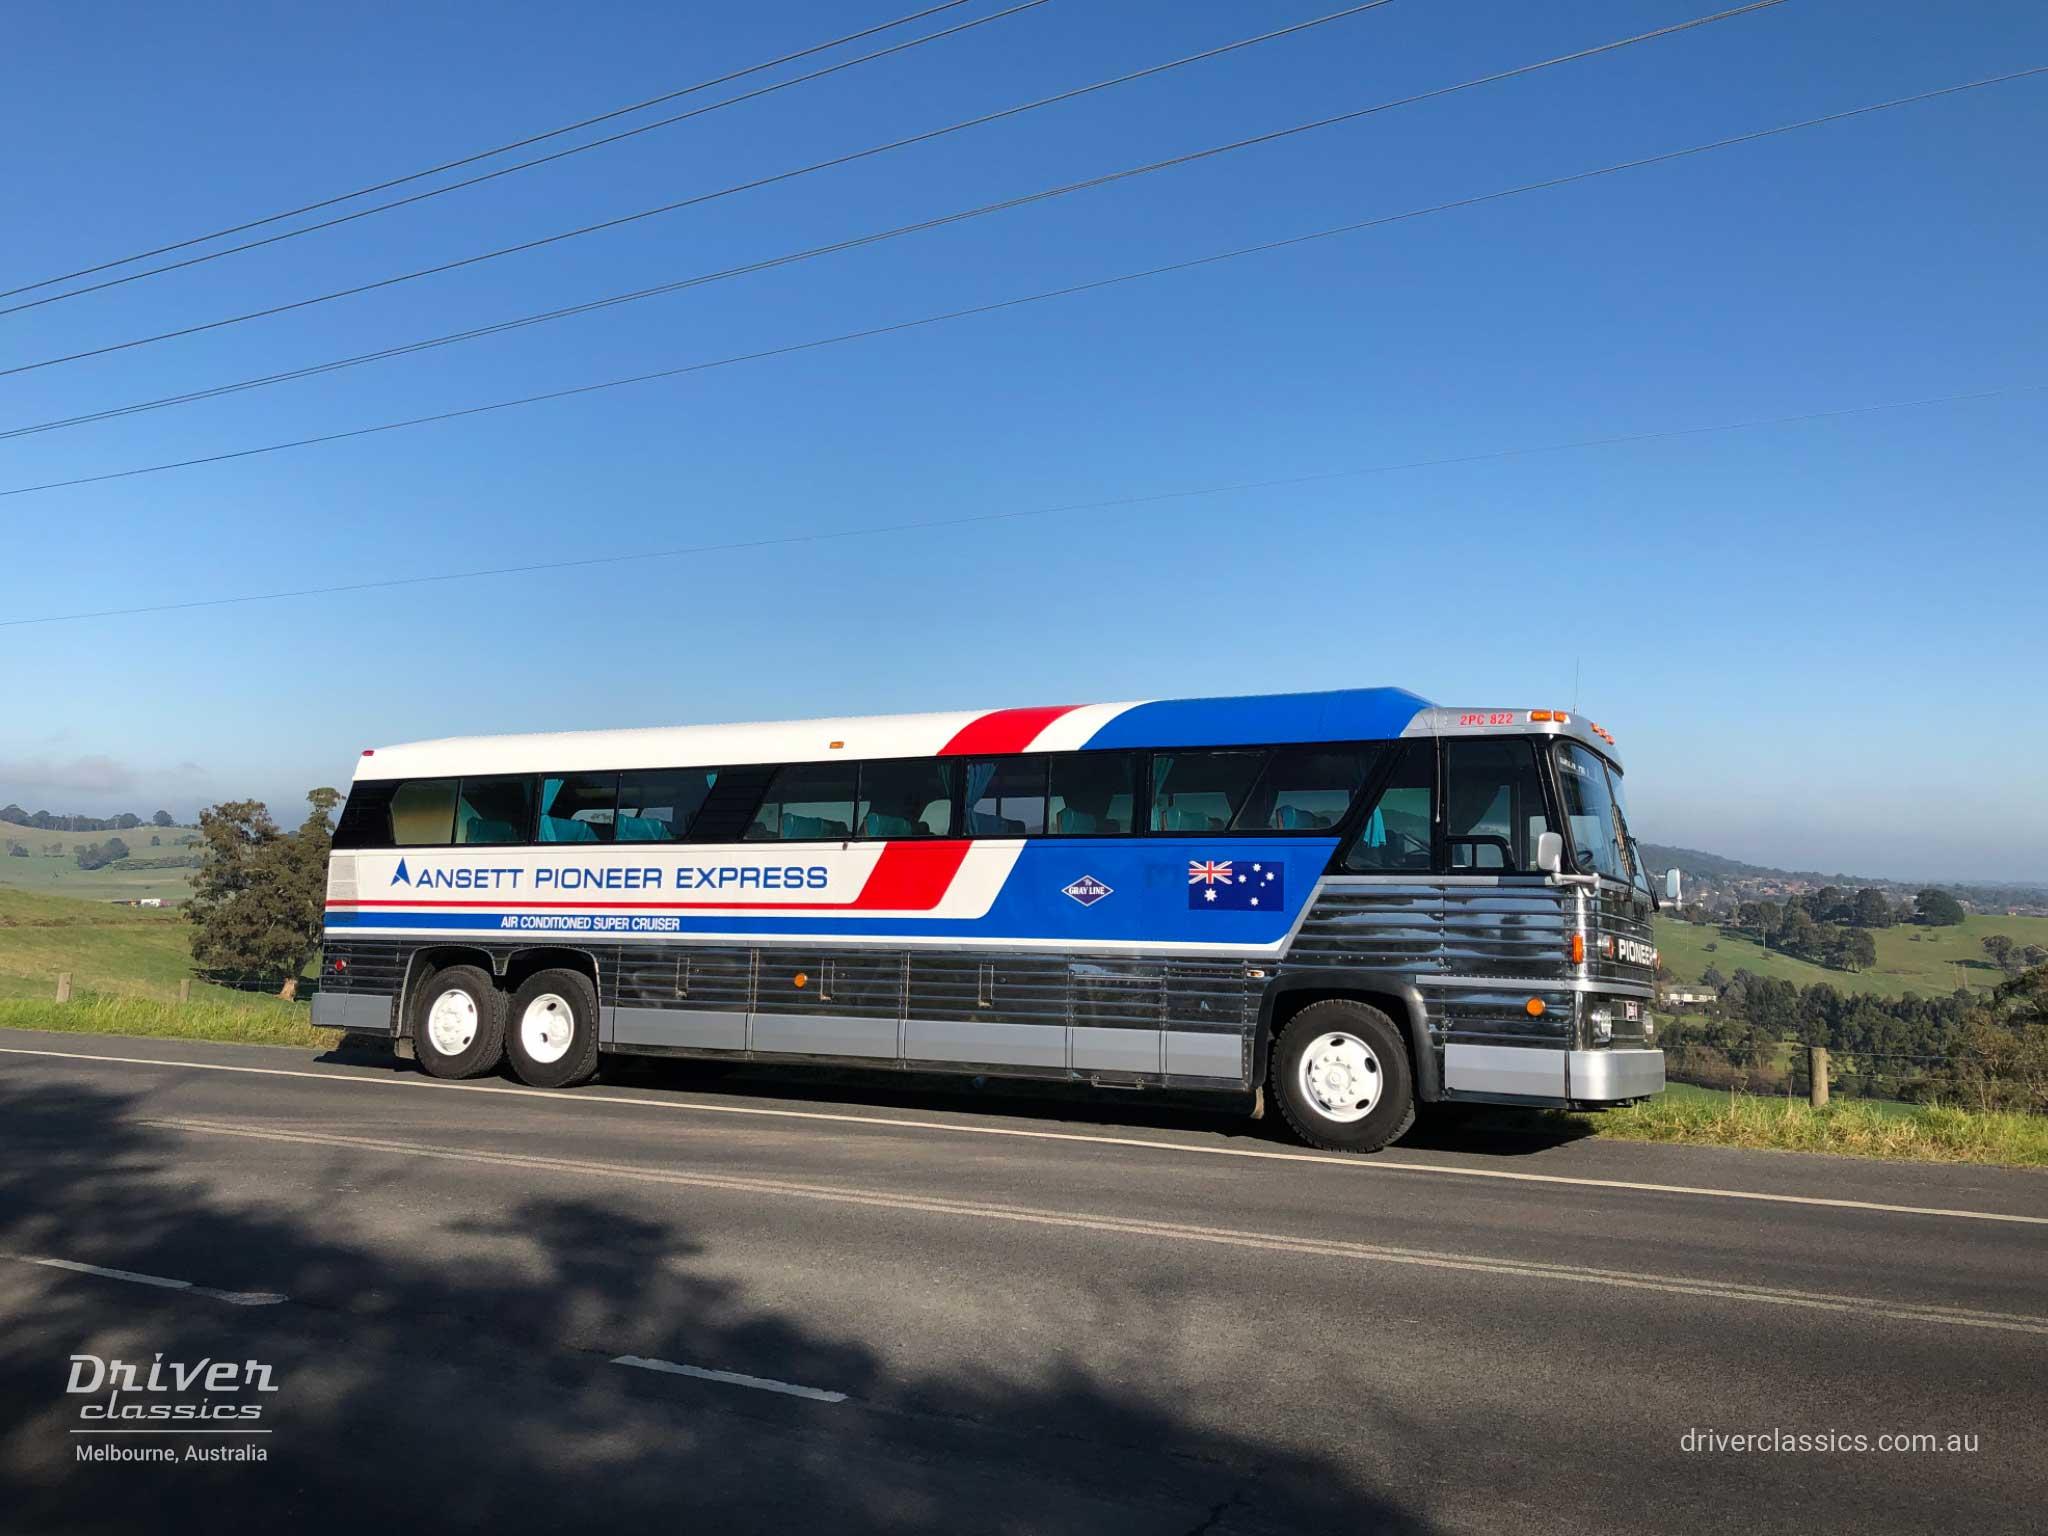 MCI MC8 bus (1976 version), side profile, Glenfern Rd Lysterfield VIC. Photo taken Jul 2020